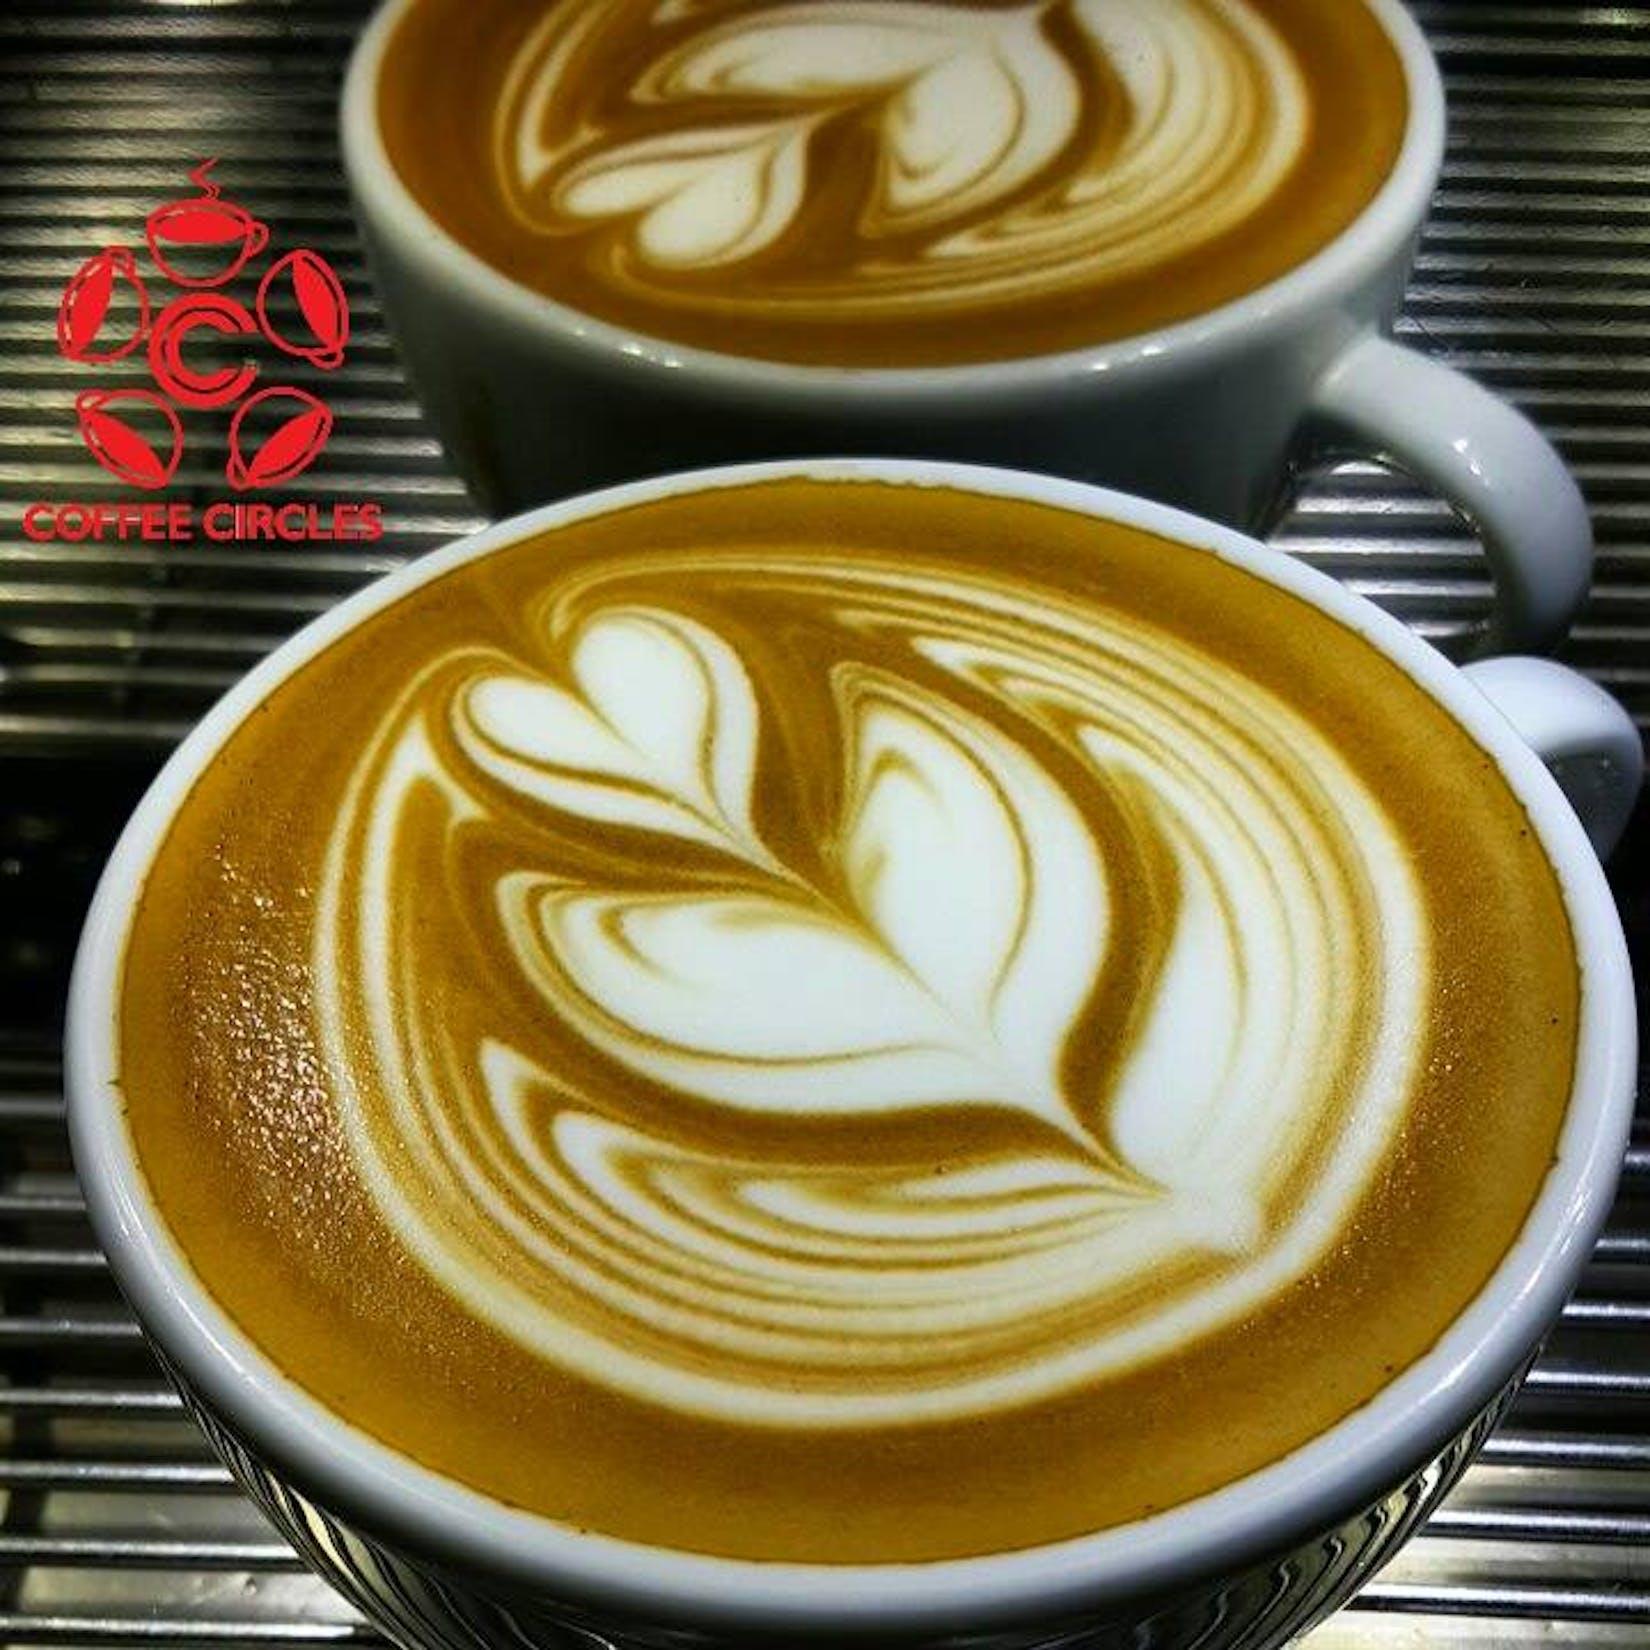 Coffee Circle @ T3 | yathar